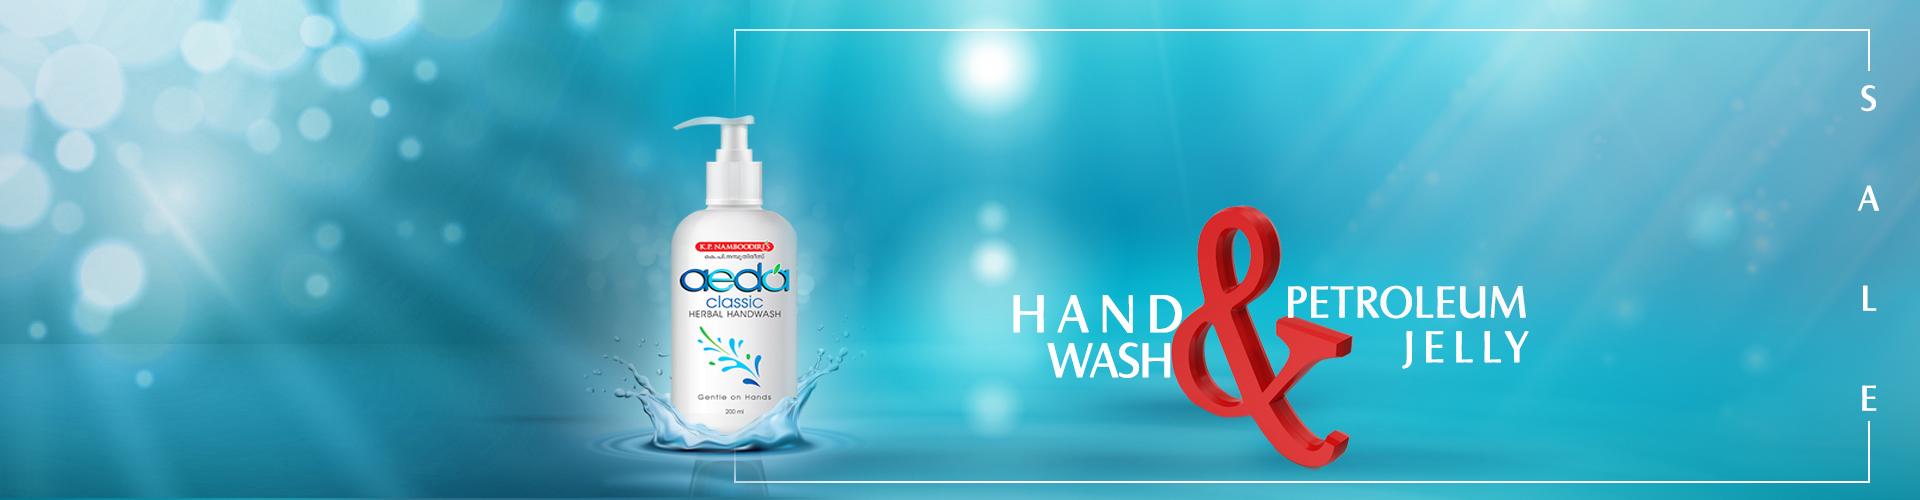 Hand wash & Petroleum jelly